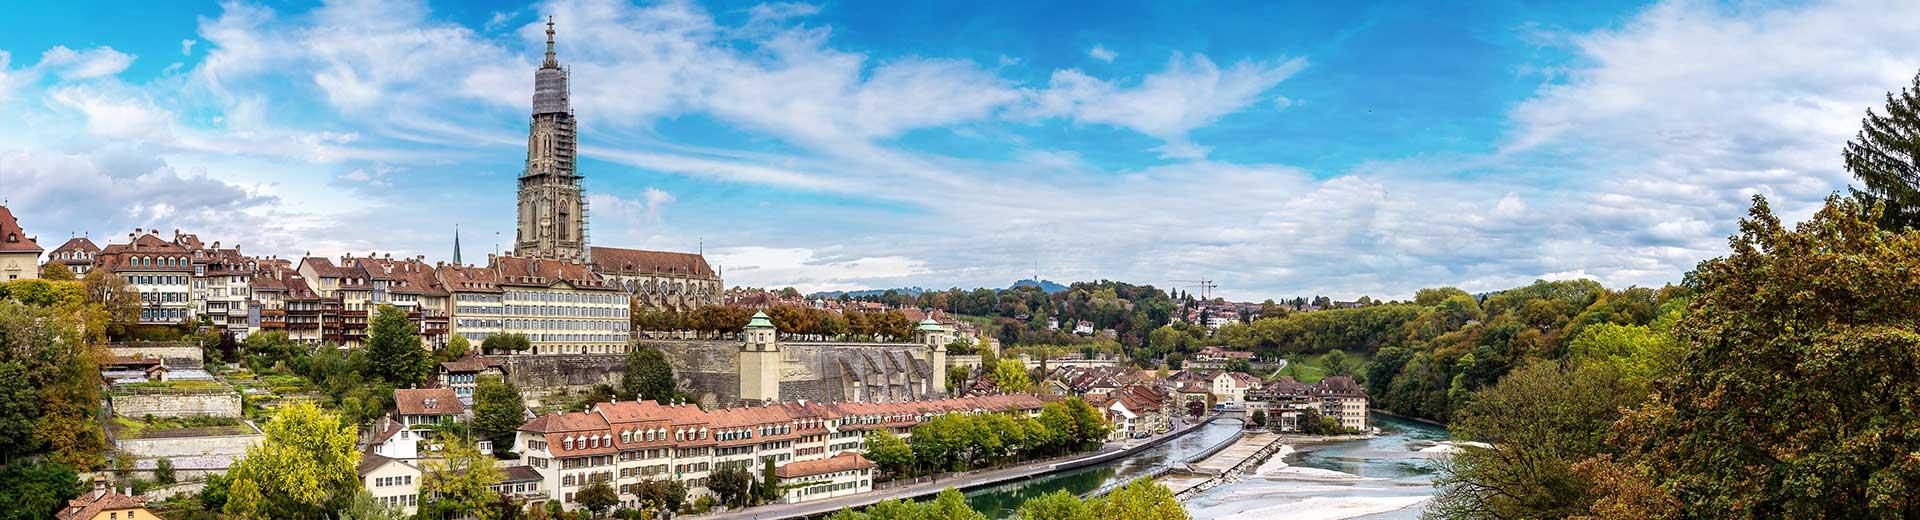 Städtereise Bern